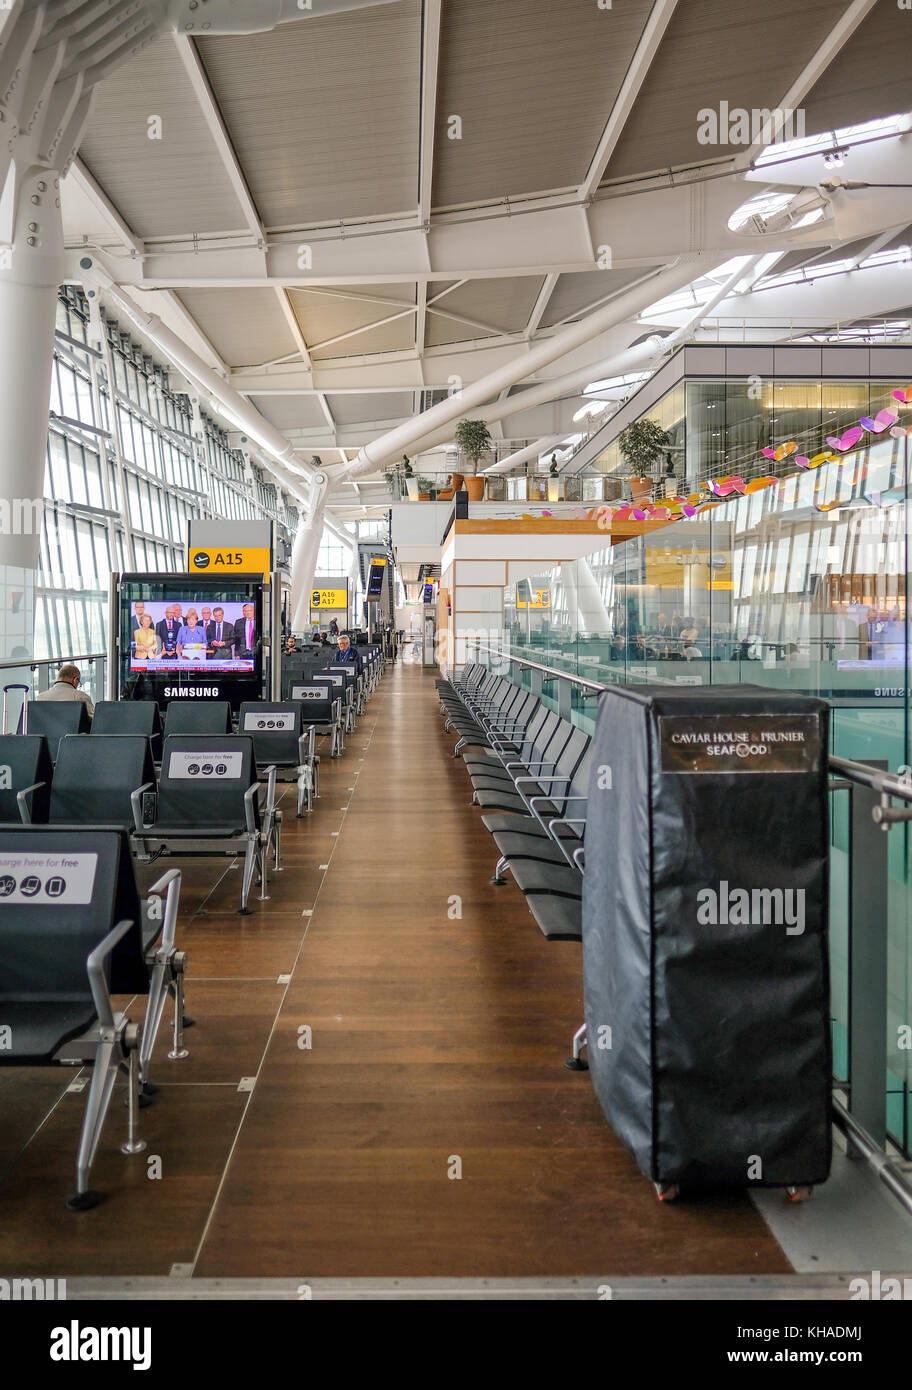 Heathrow, Terminal 5, London, UK - September 25, 2017:  Inside Terminal 5, charging your technology area.  Quiet - Stock Image